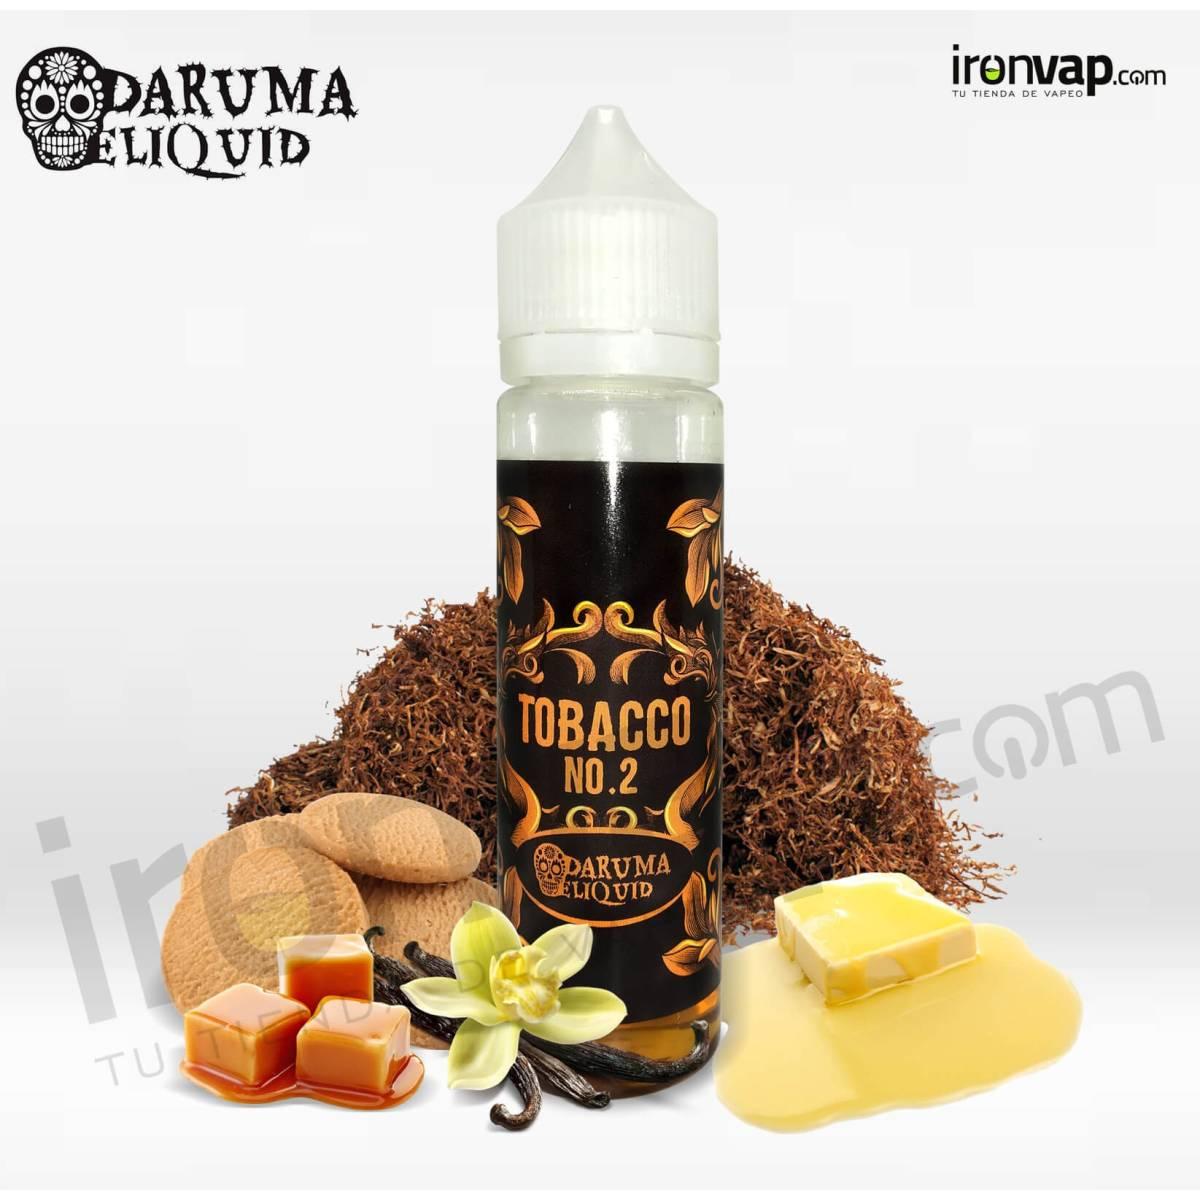 Tobacco nº2 50ml TPD - Daruma eliquid